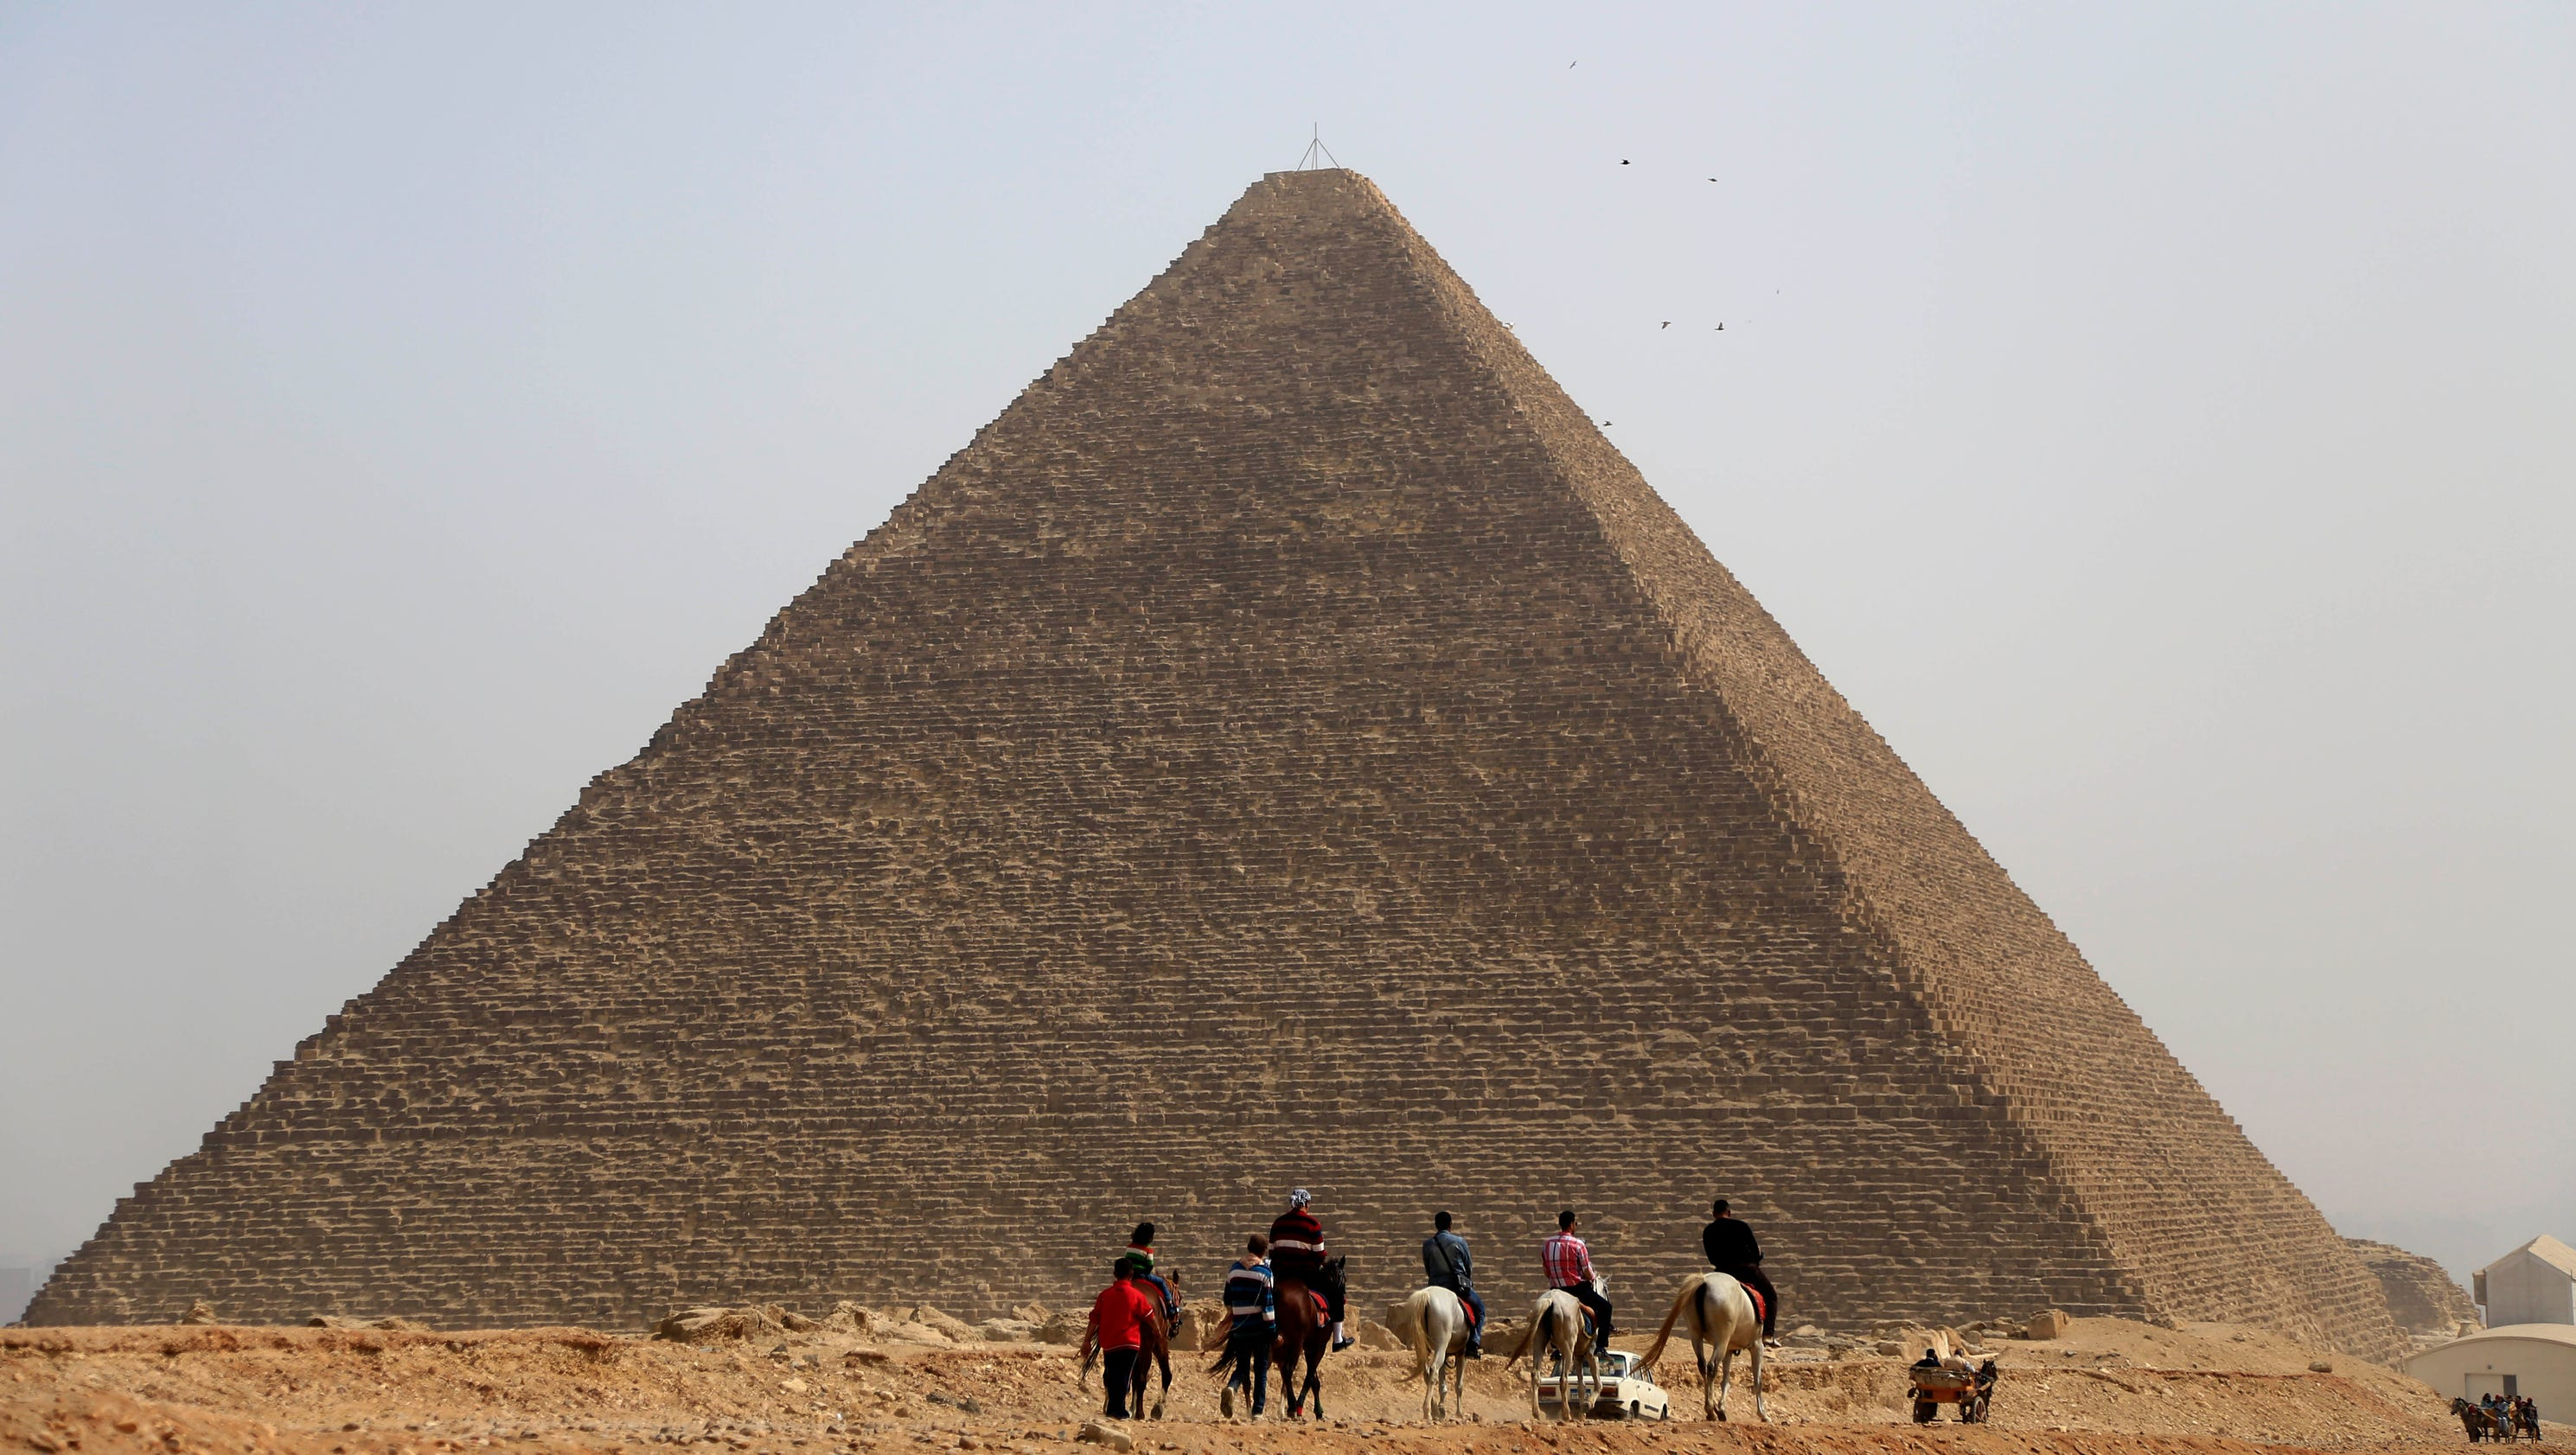 how to build pyramid unmuseum